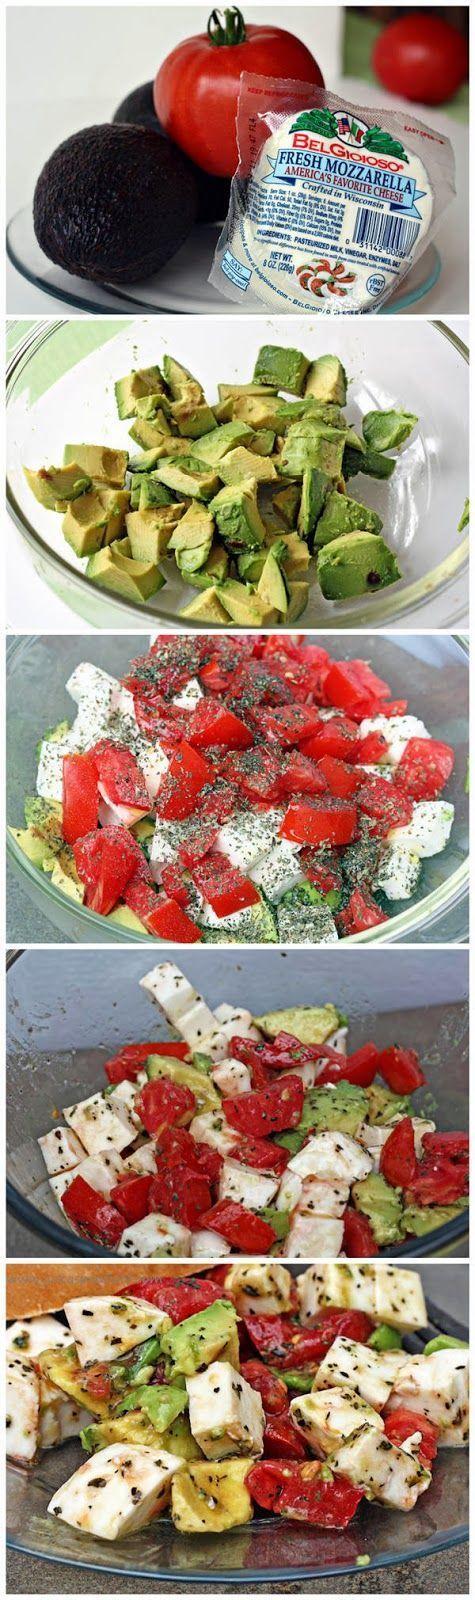 Fresh alternative to pasta salad Find more details at http://yumwow.com/posts/Fresh-alternative-to-pasta-salad-61078